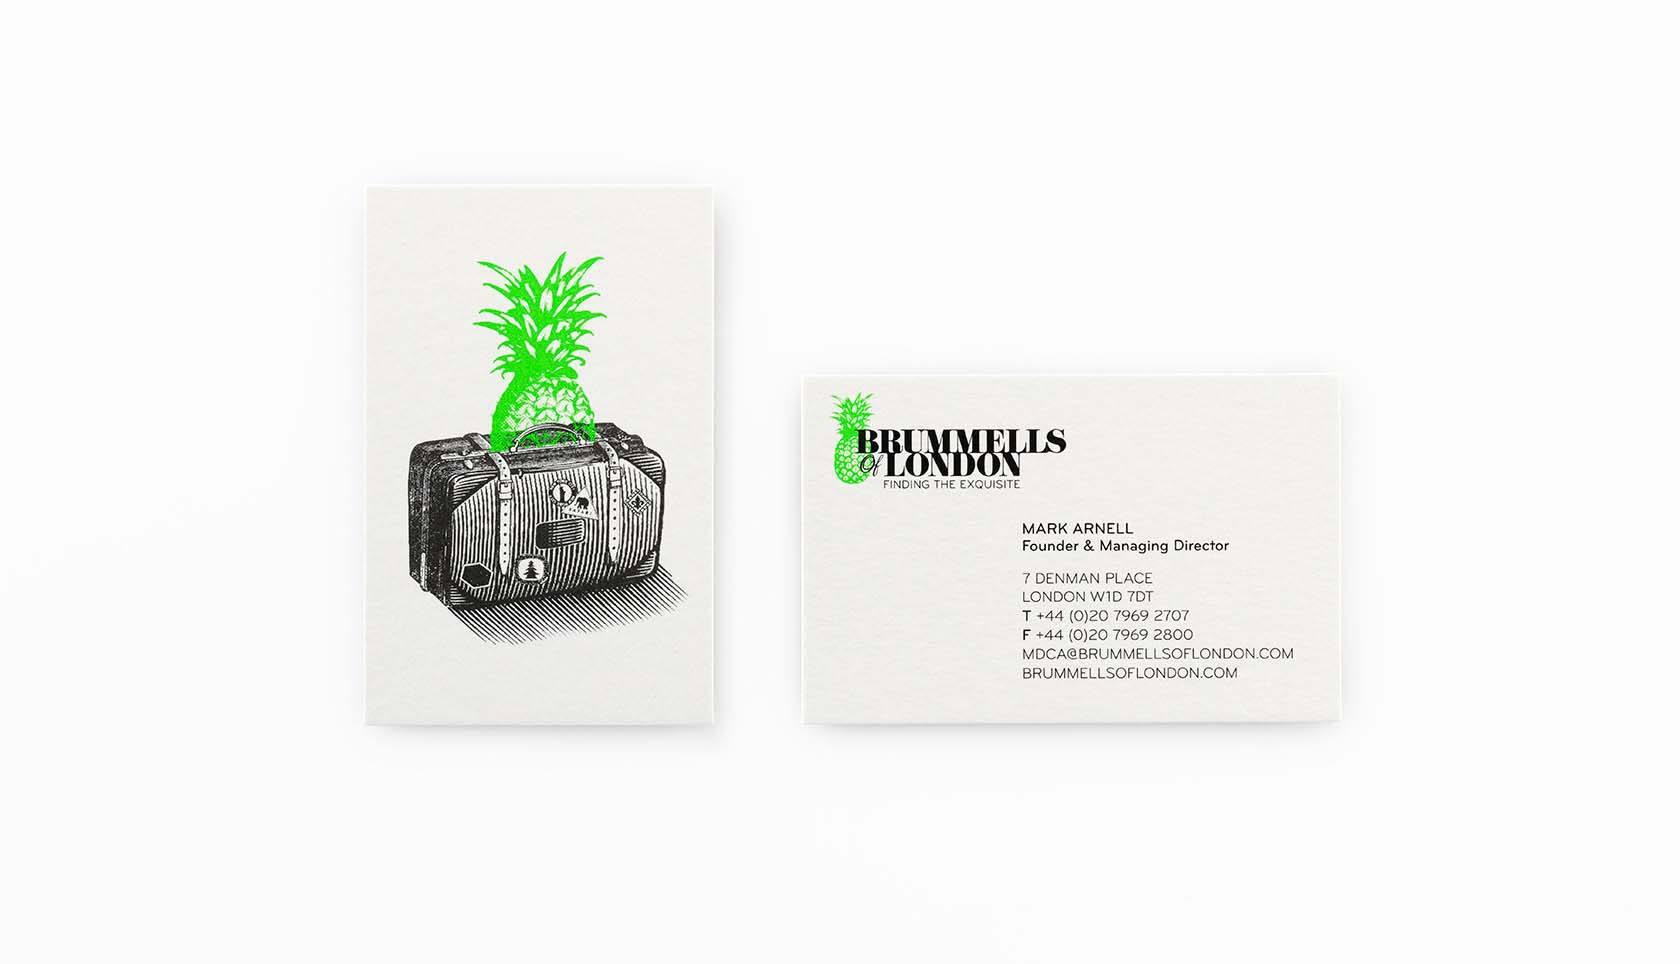 WMH-BRUMMELLS-OF-LONDON-BUSINESS-CARDS-WEB image